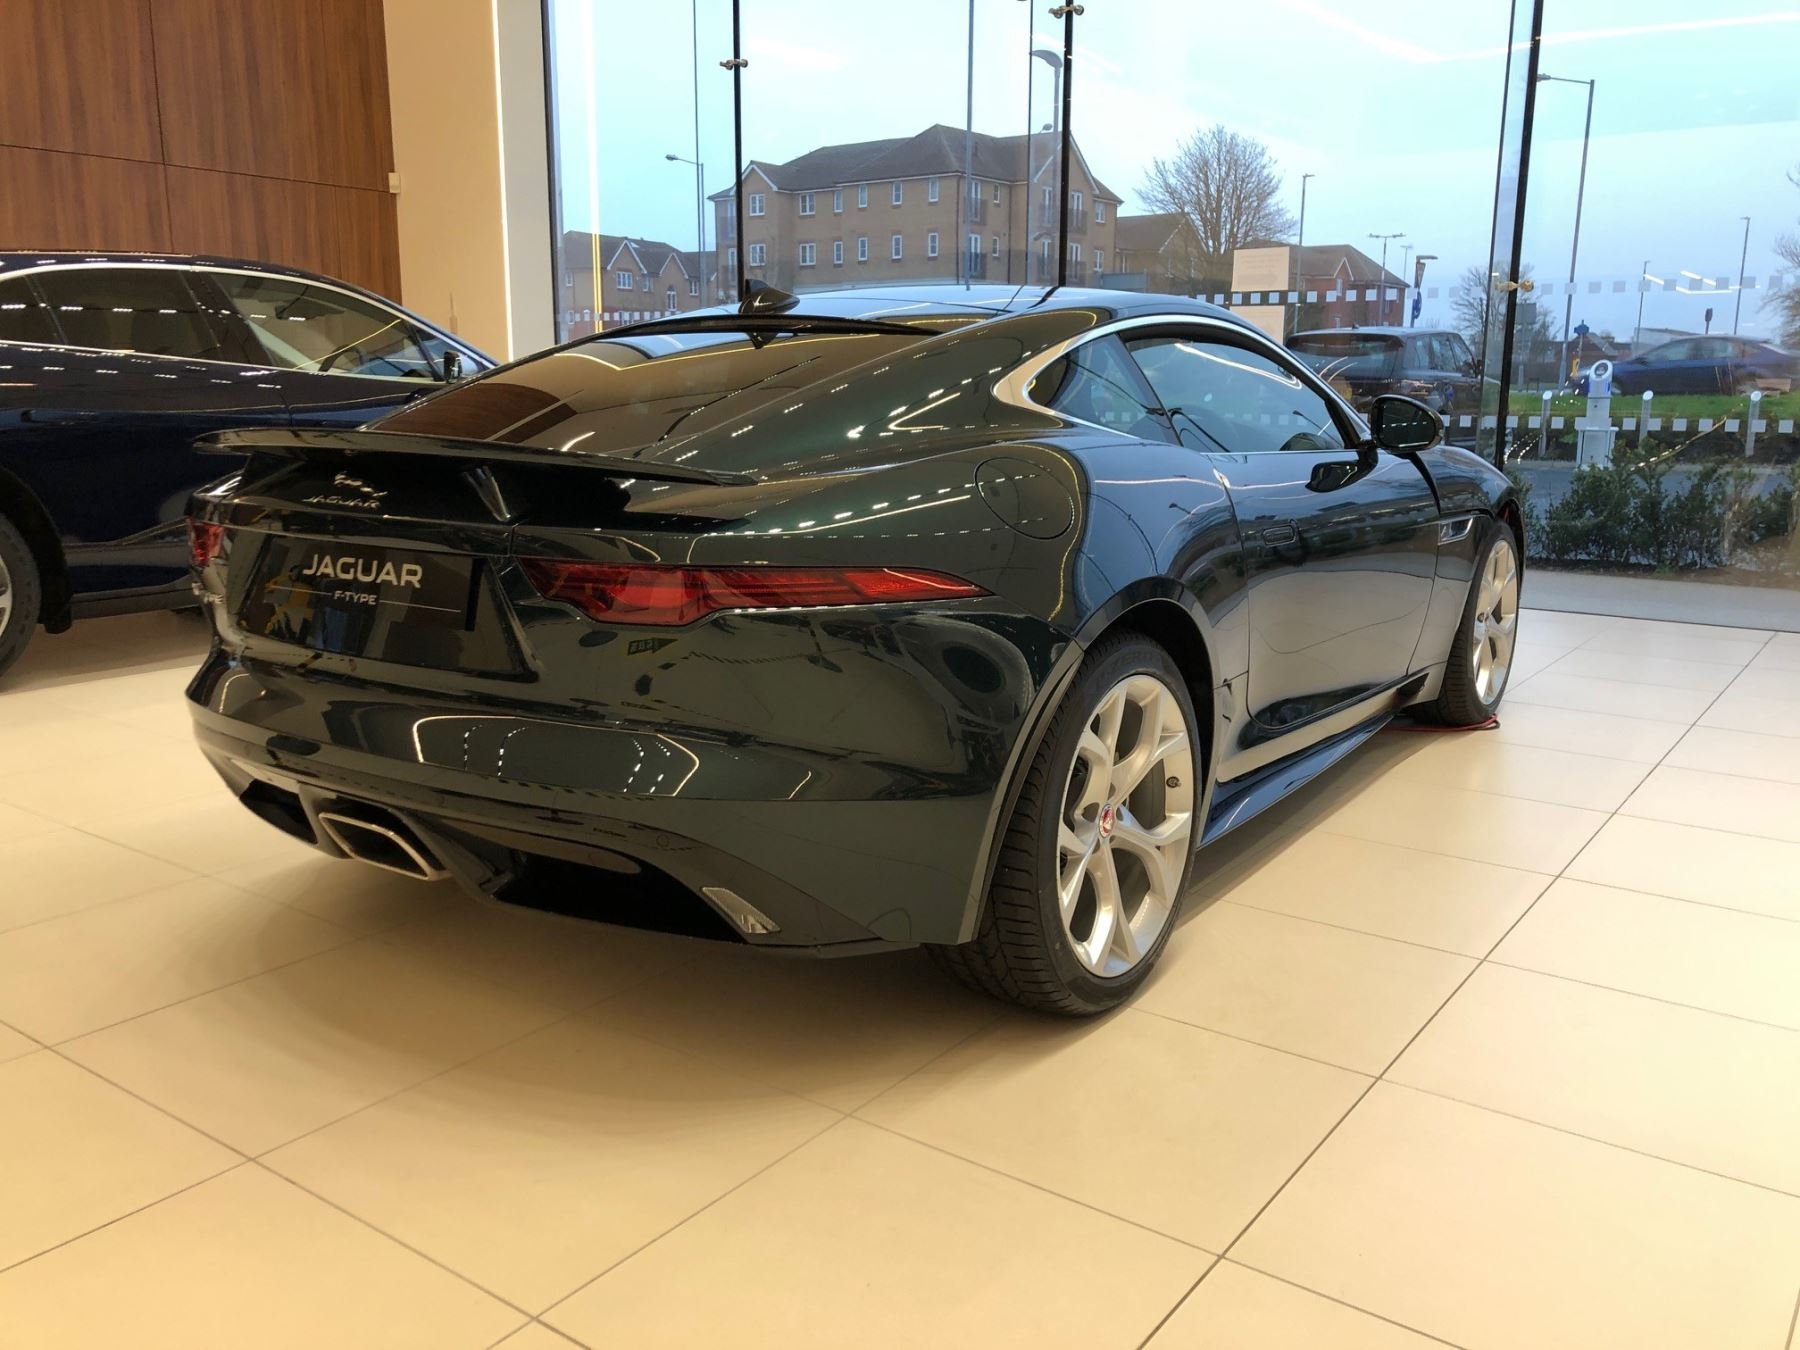 Jaguar F-TYPE Coupe Coupe 2.0 P300 RWD R-Dynamic image 2